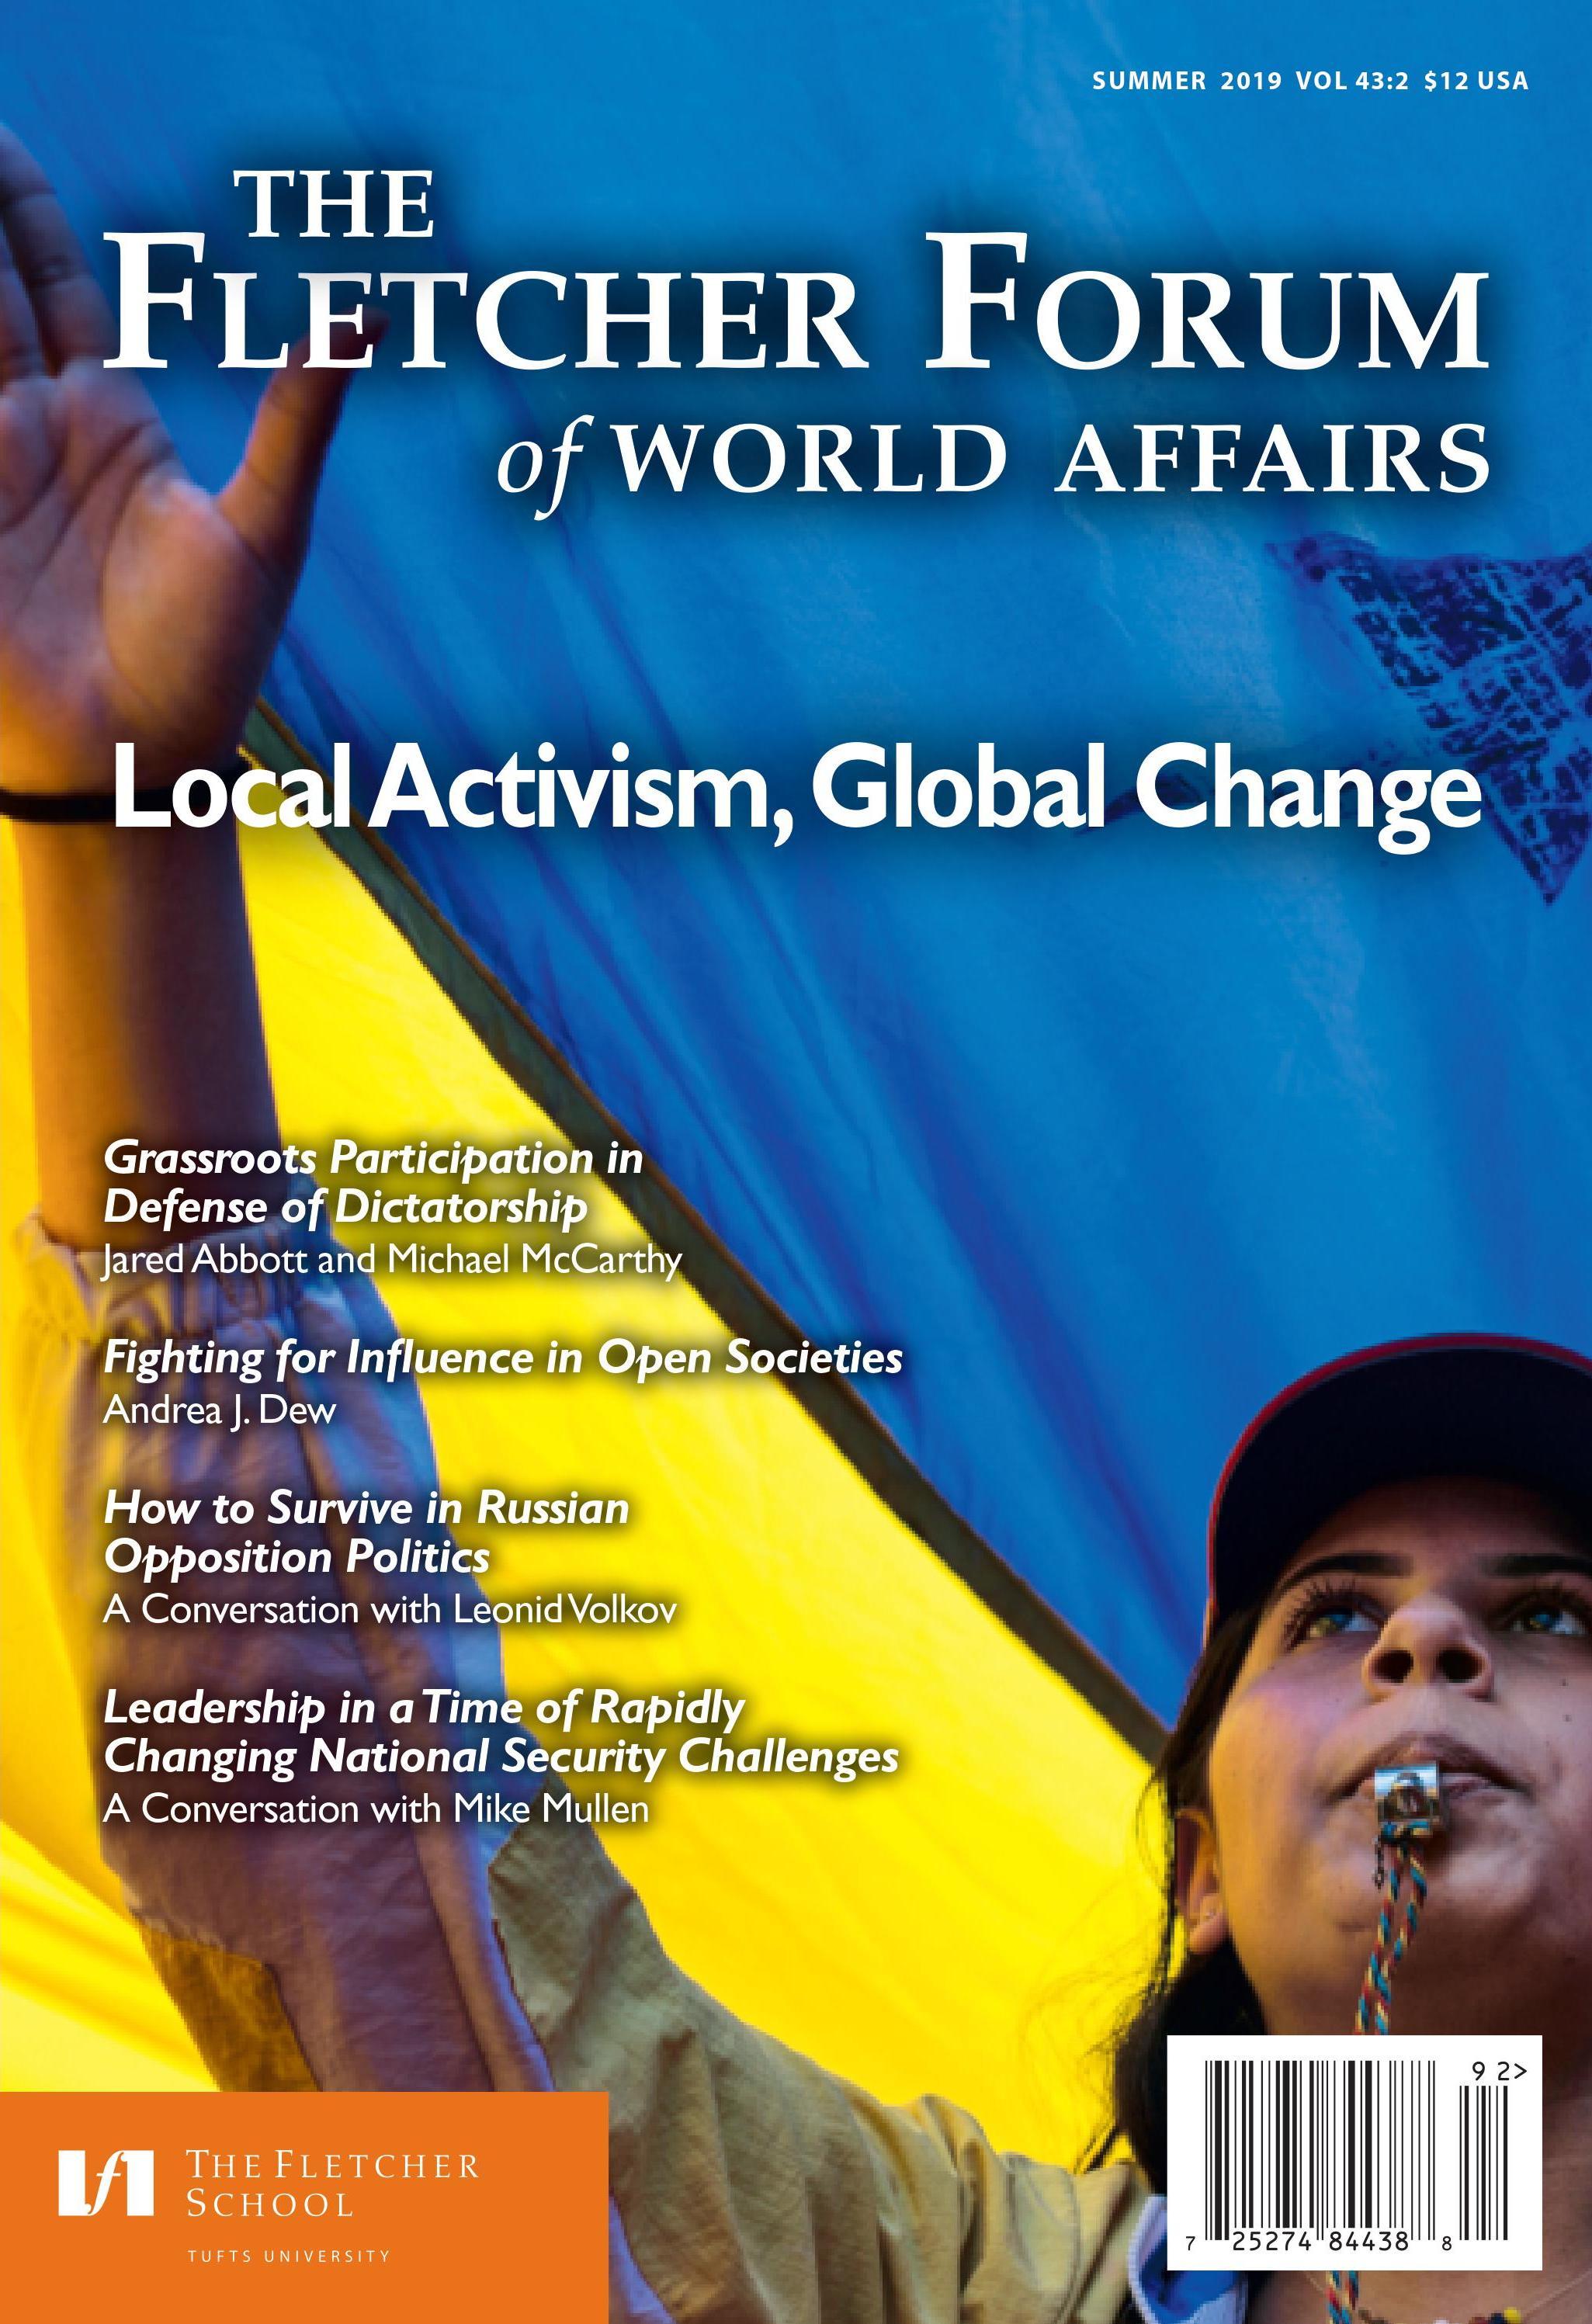 Cover Image 43.2.jpg